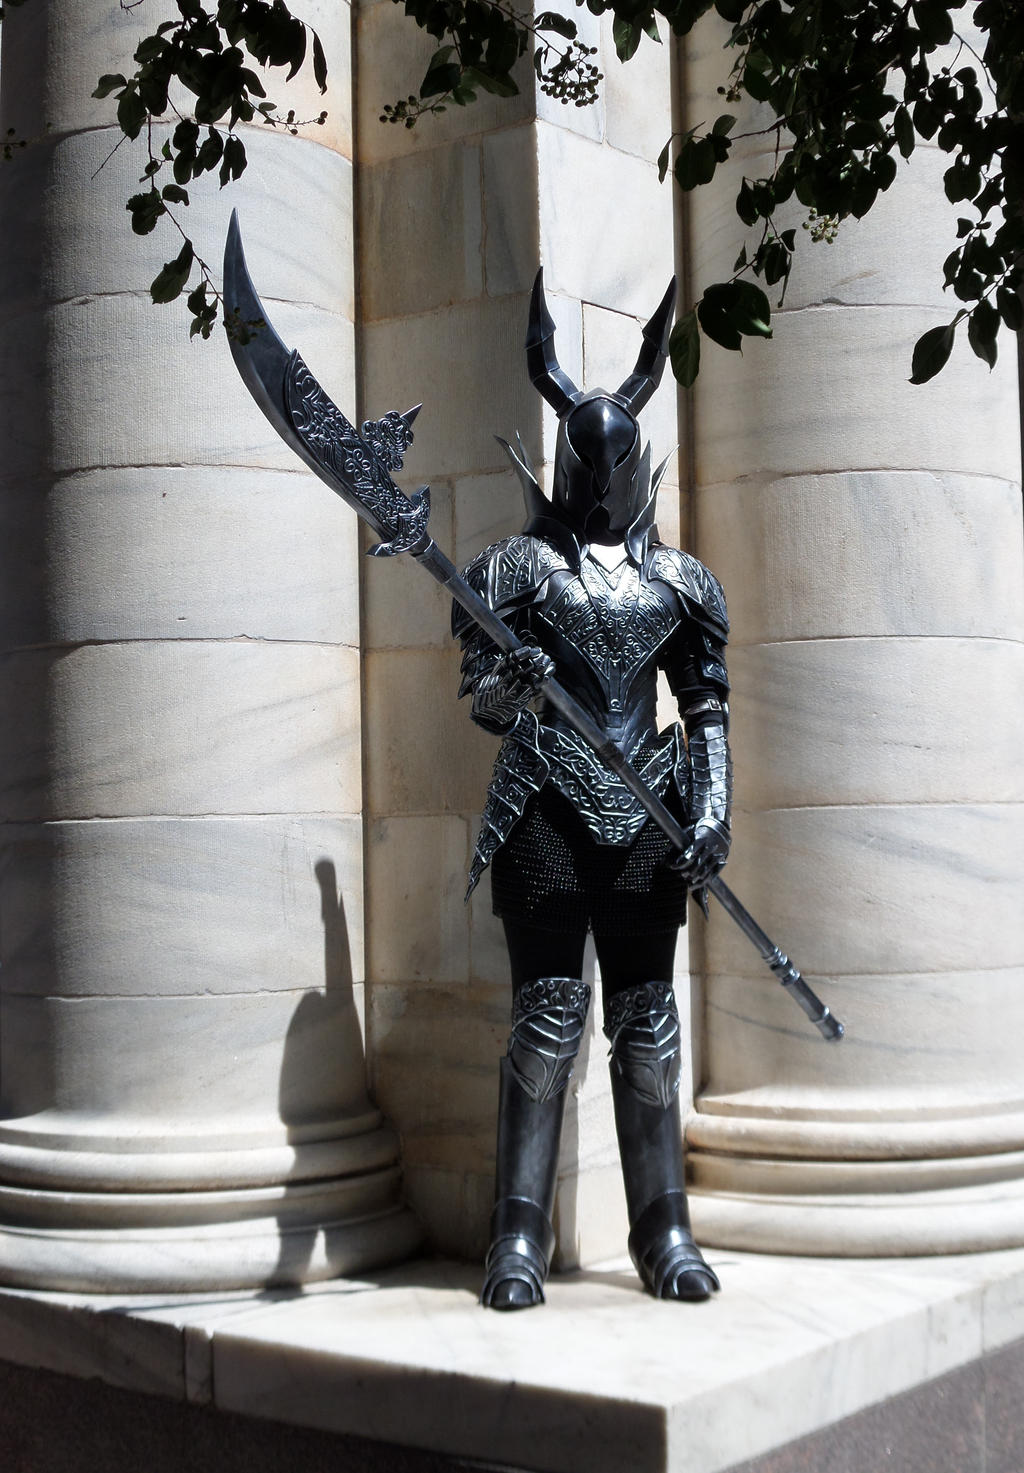 dark souls black knight cosplay by silvericedragon1 on